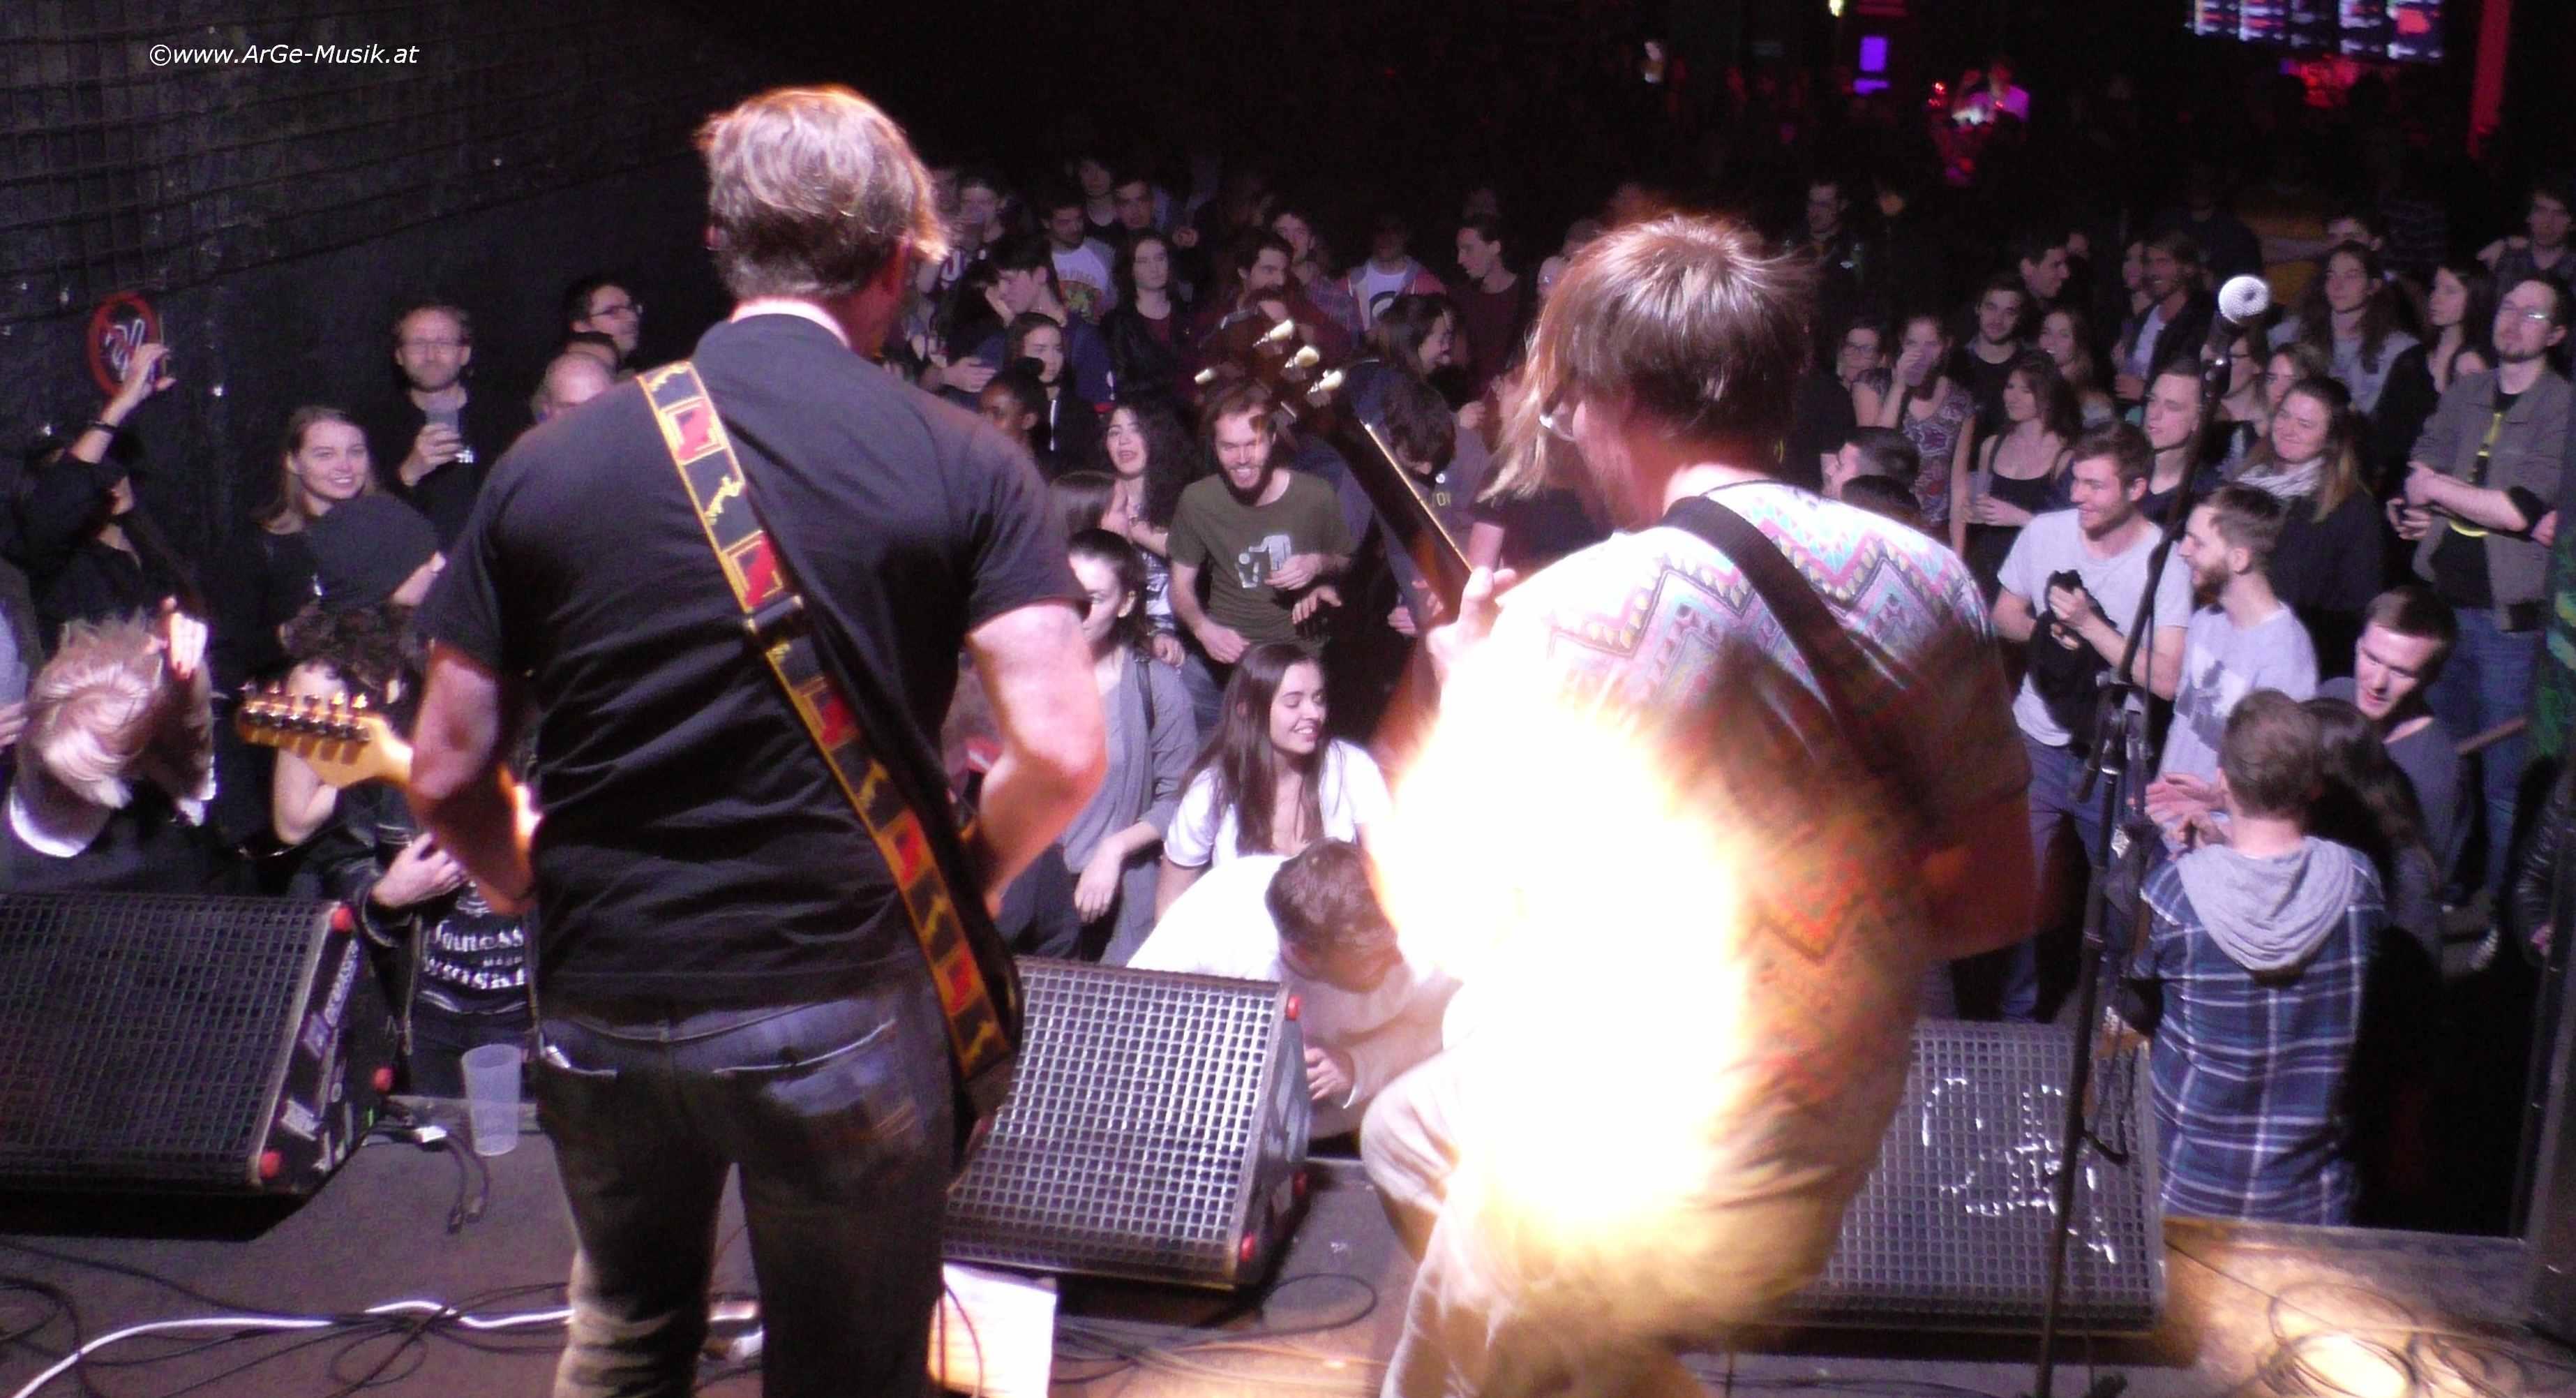 Everyone's Prostitute on stage - Kurt Cobain Tribute 2017 im Flex